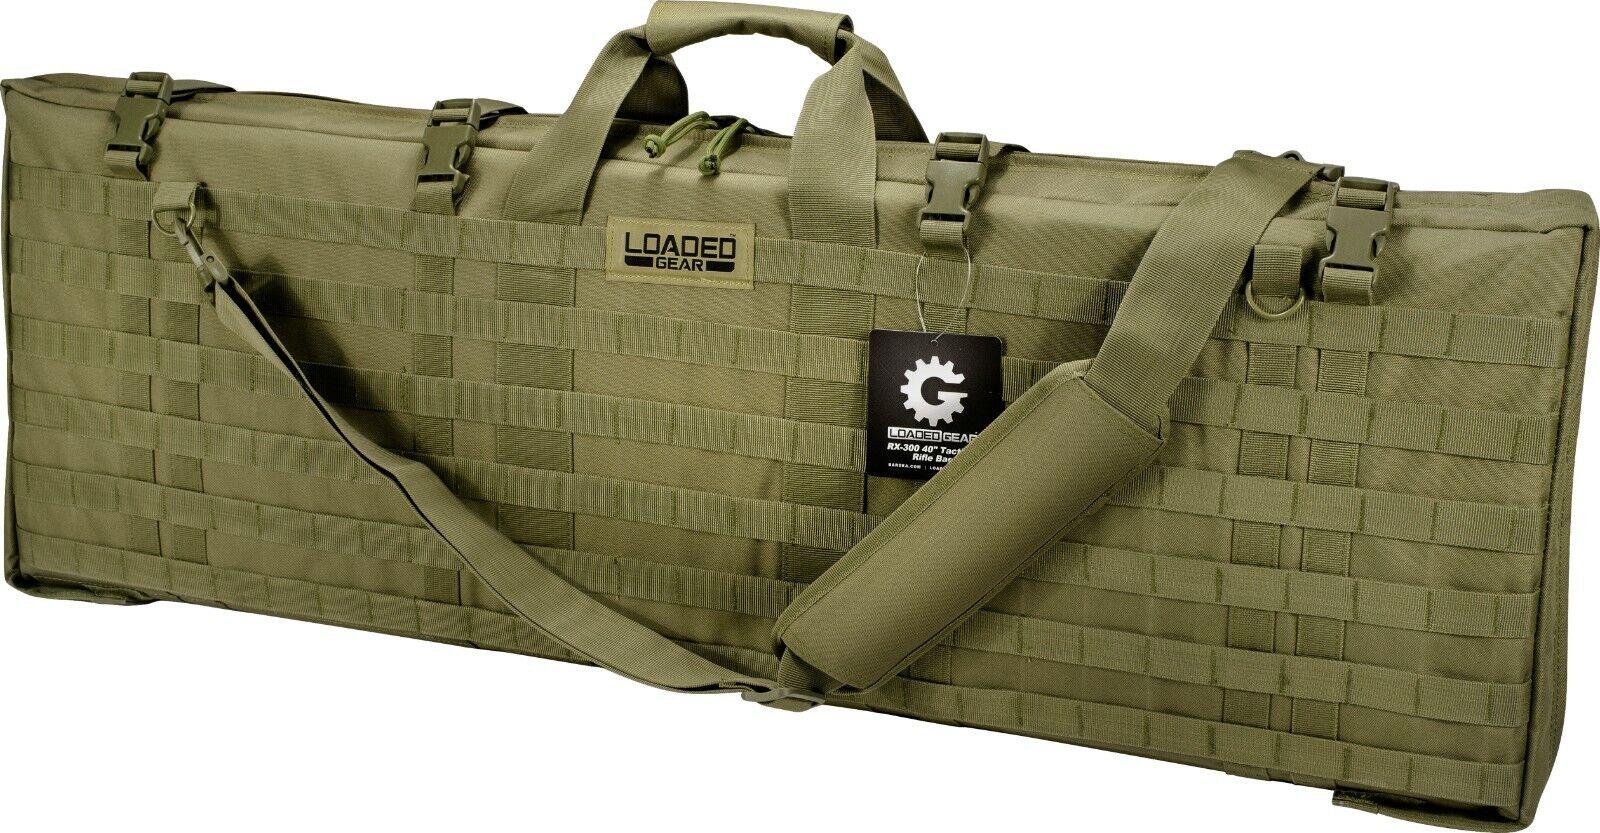 Barska Loaded Gear RX-300 OD Green 40 Inch Rifle Gun Padded